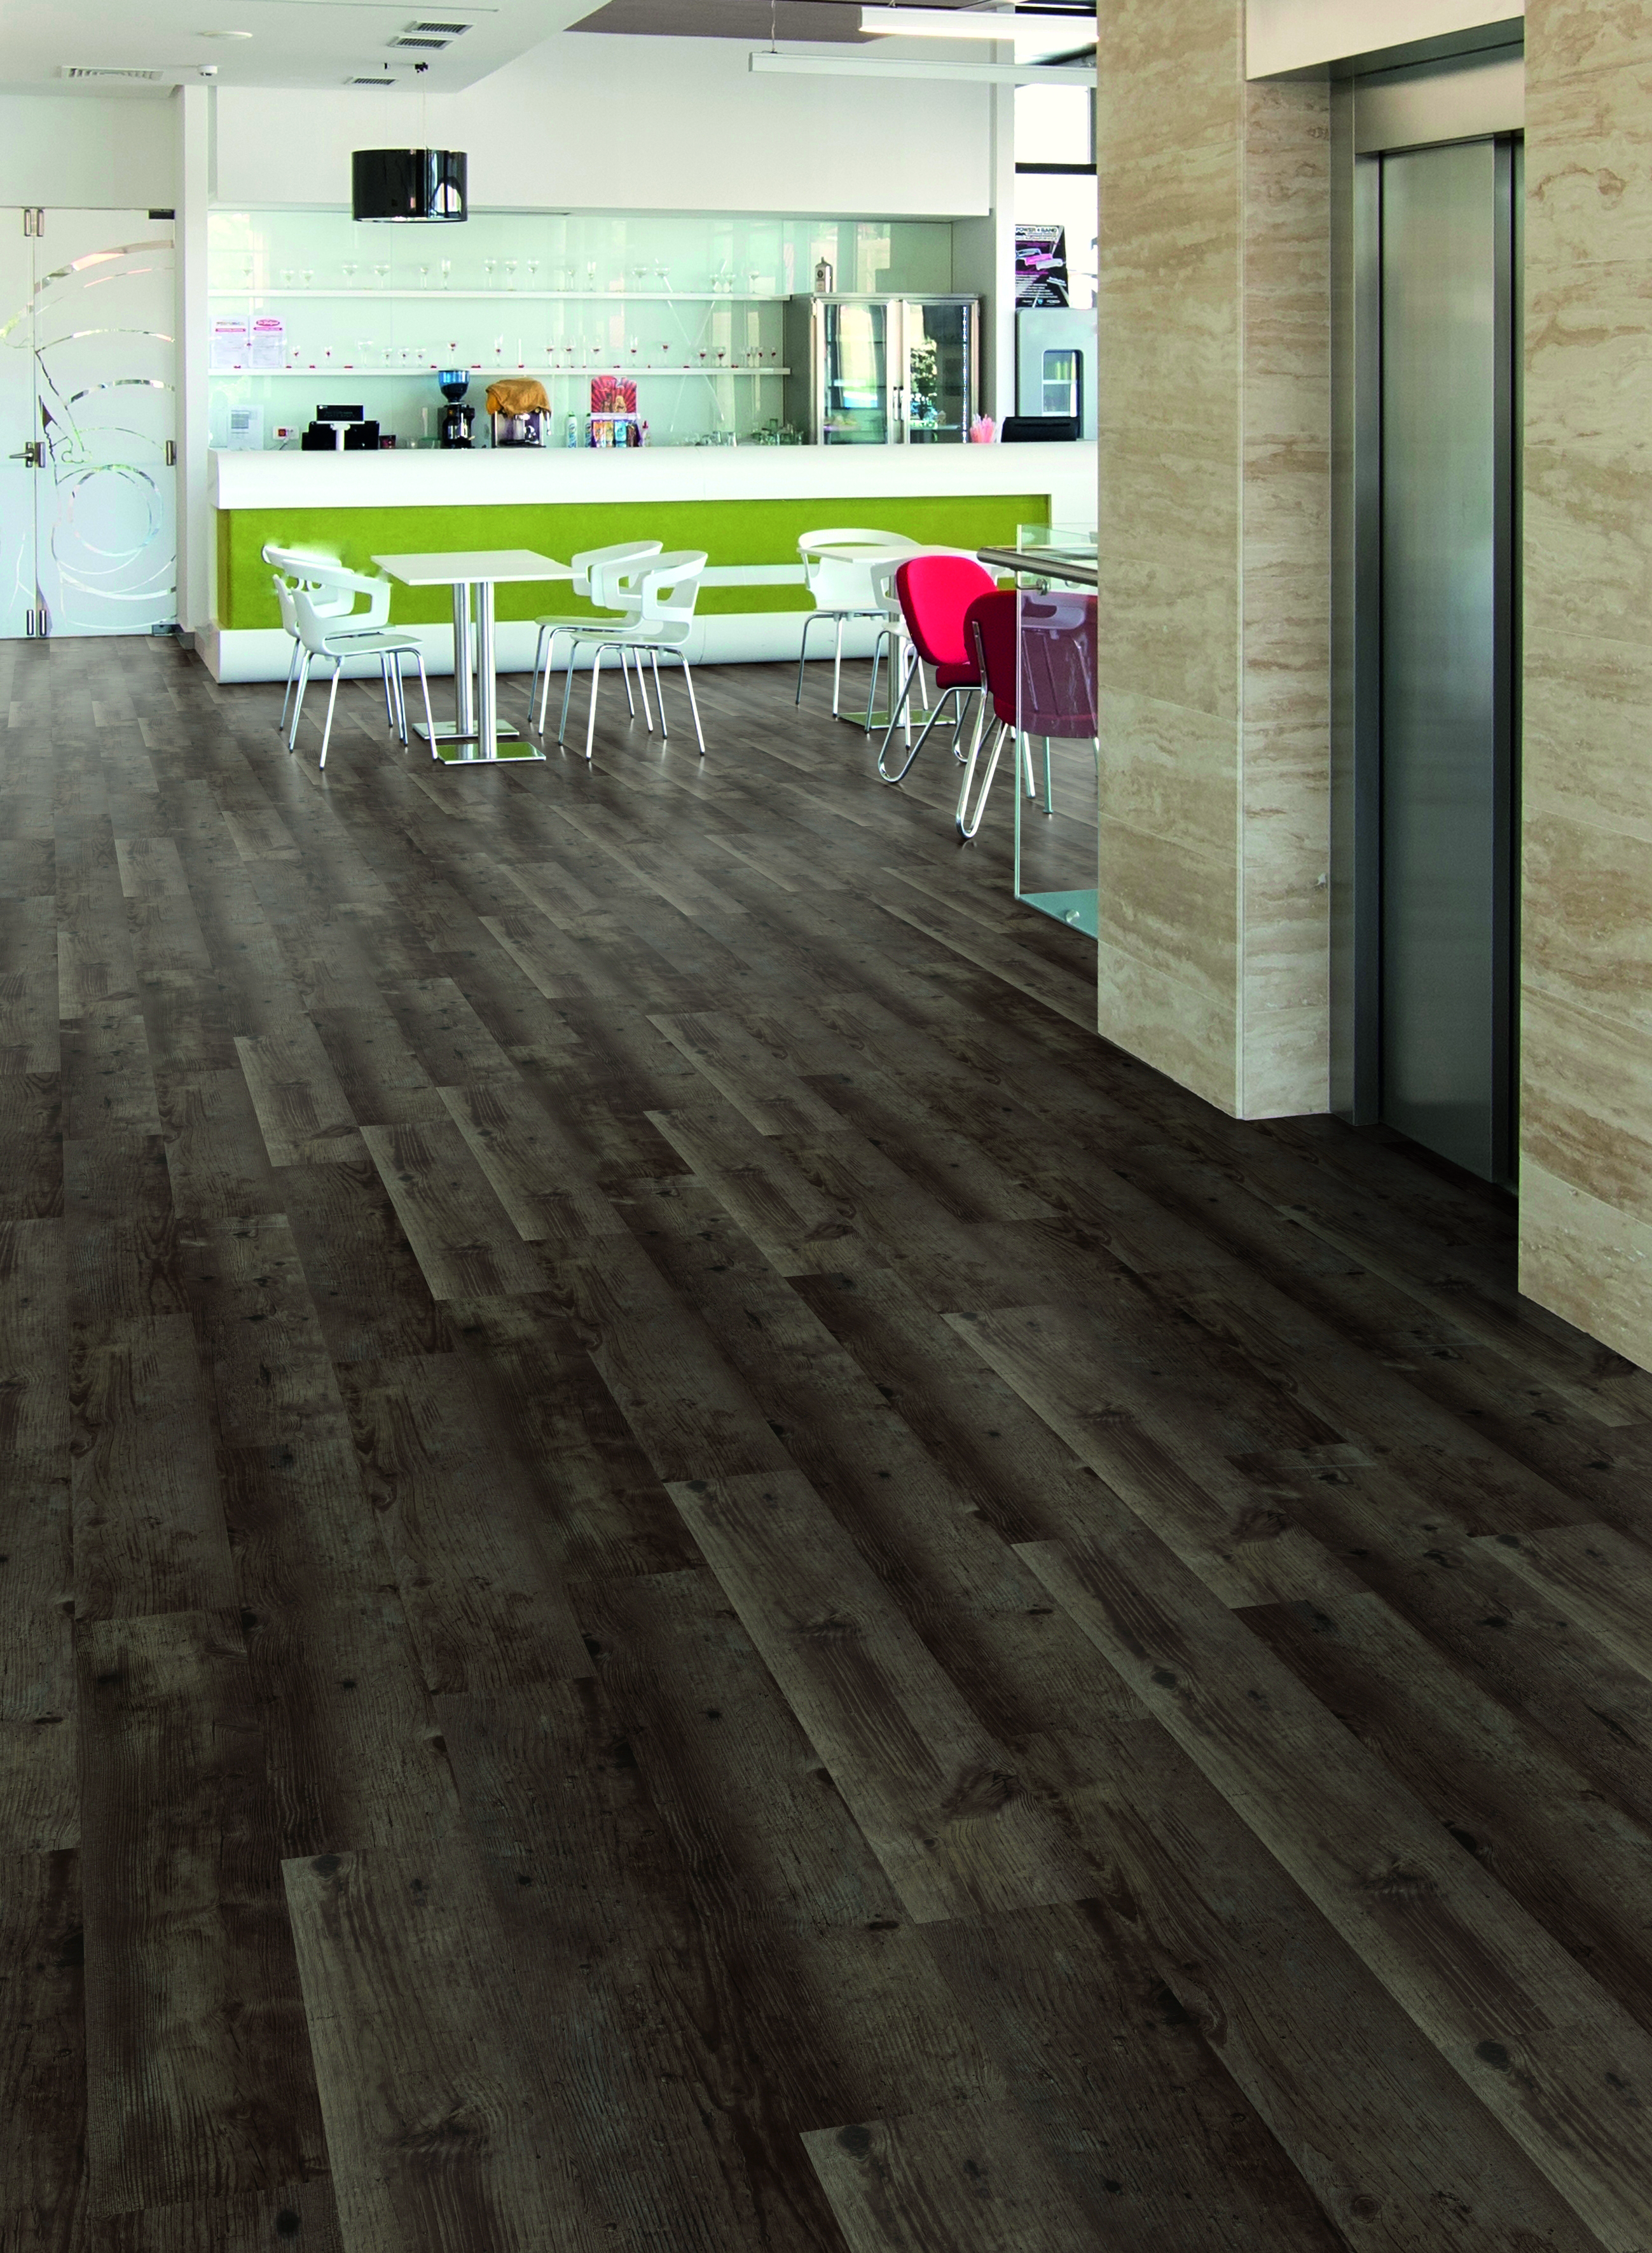 Raumbild - Designboden - Contract 0,55 Planke Click 1